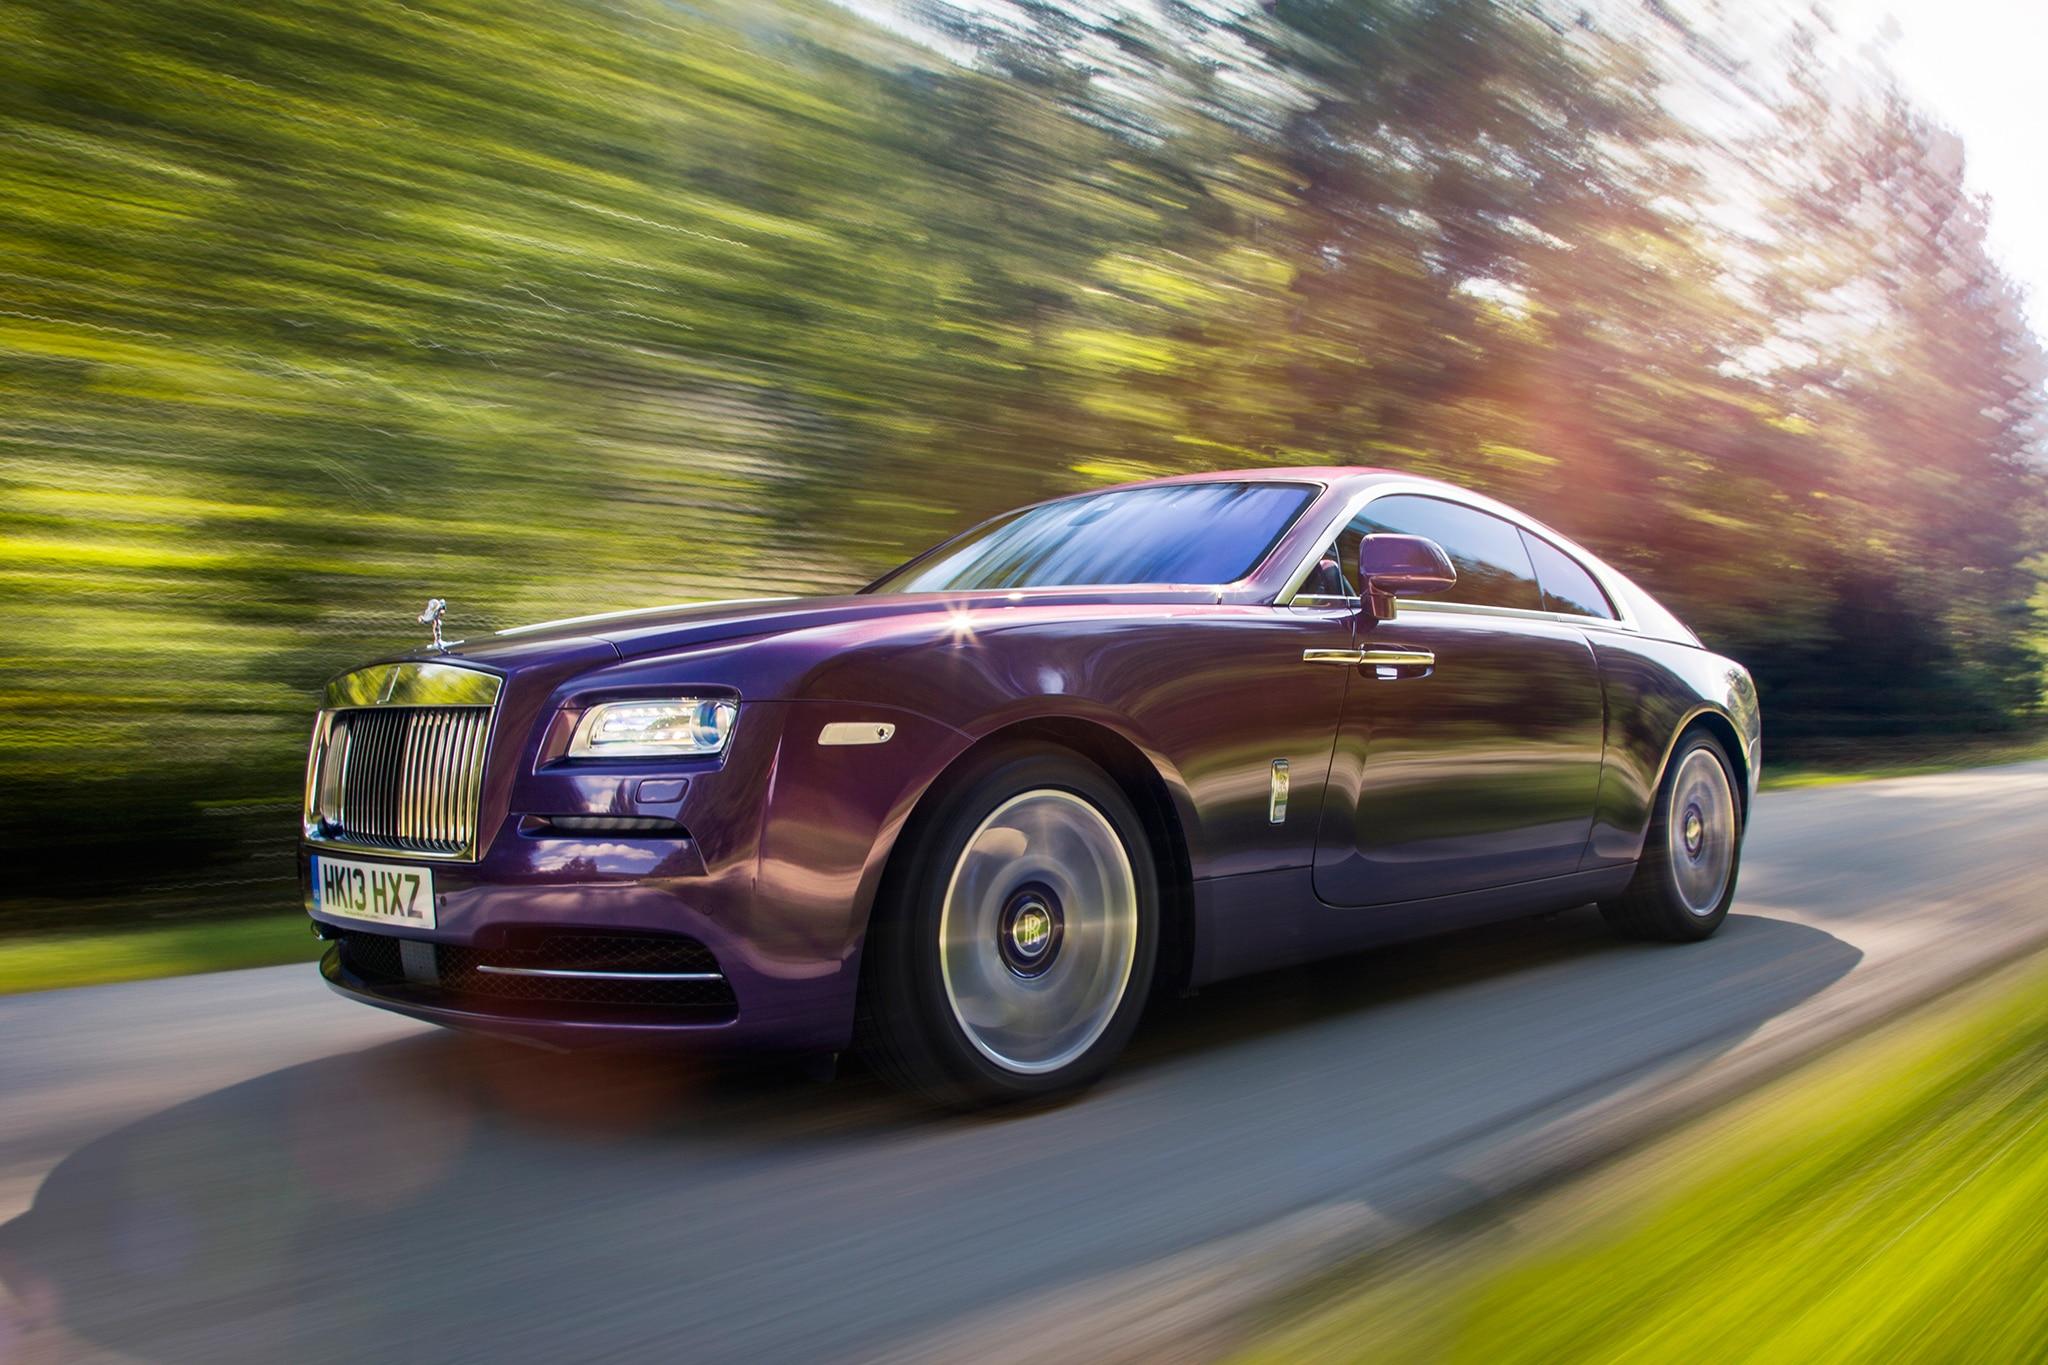 2014 Rolls Royce Wraith Three Quarters View 51